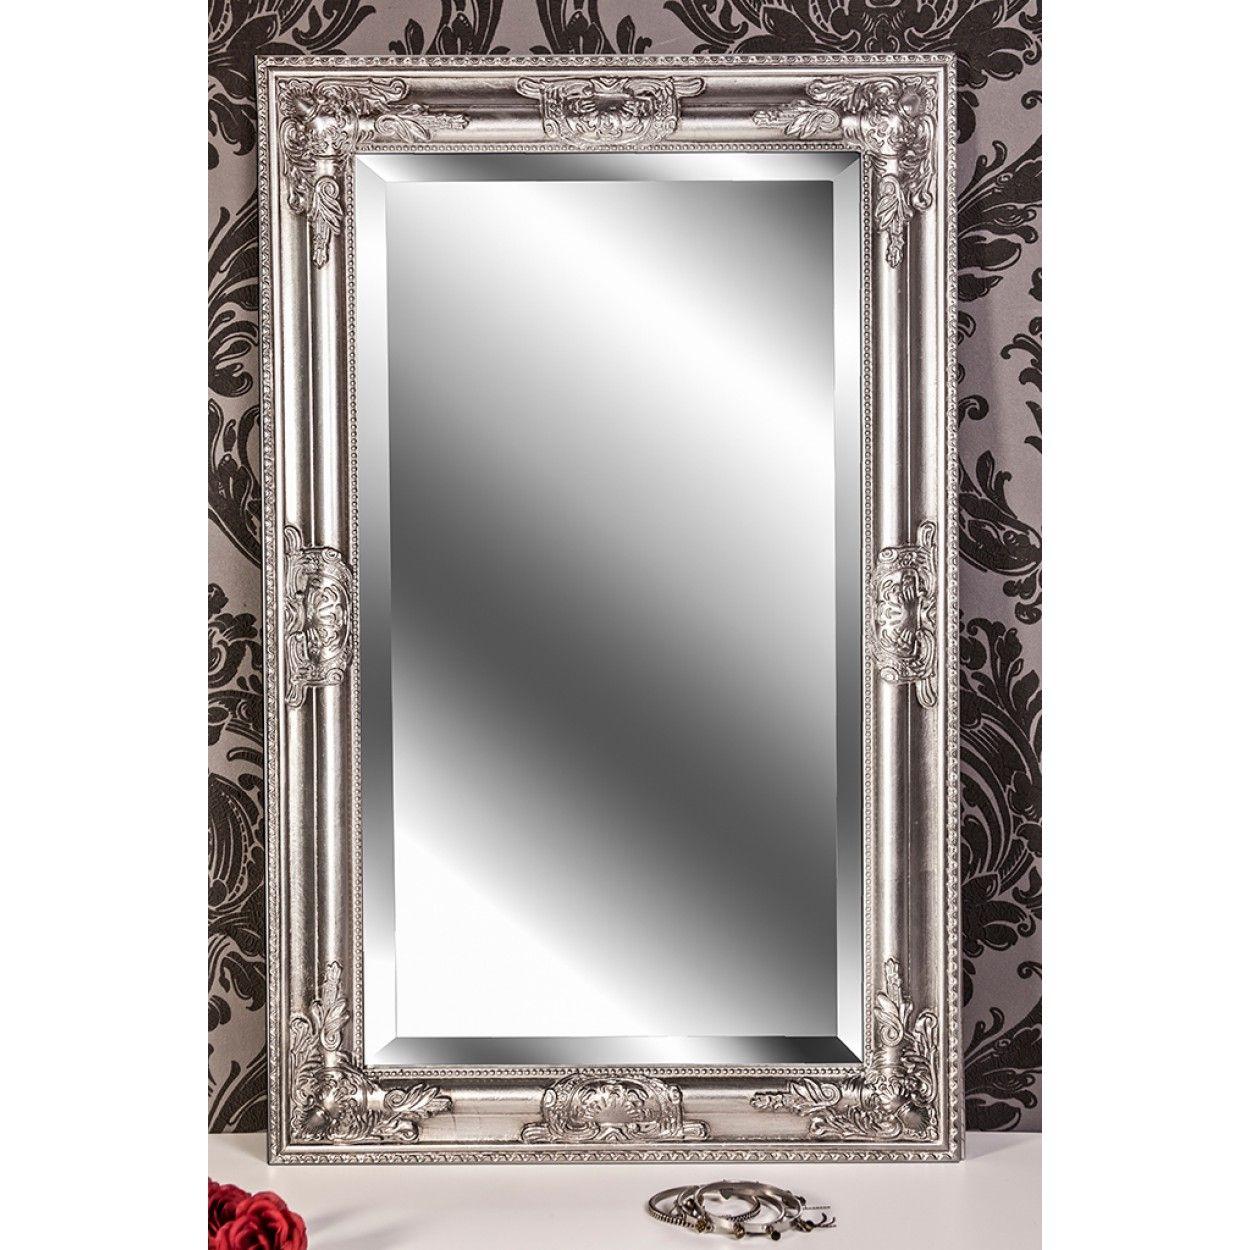 Wandspiegel Silber Antik Barock Kim 80 X 50 Cm Spiegel Spiegel